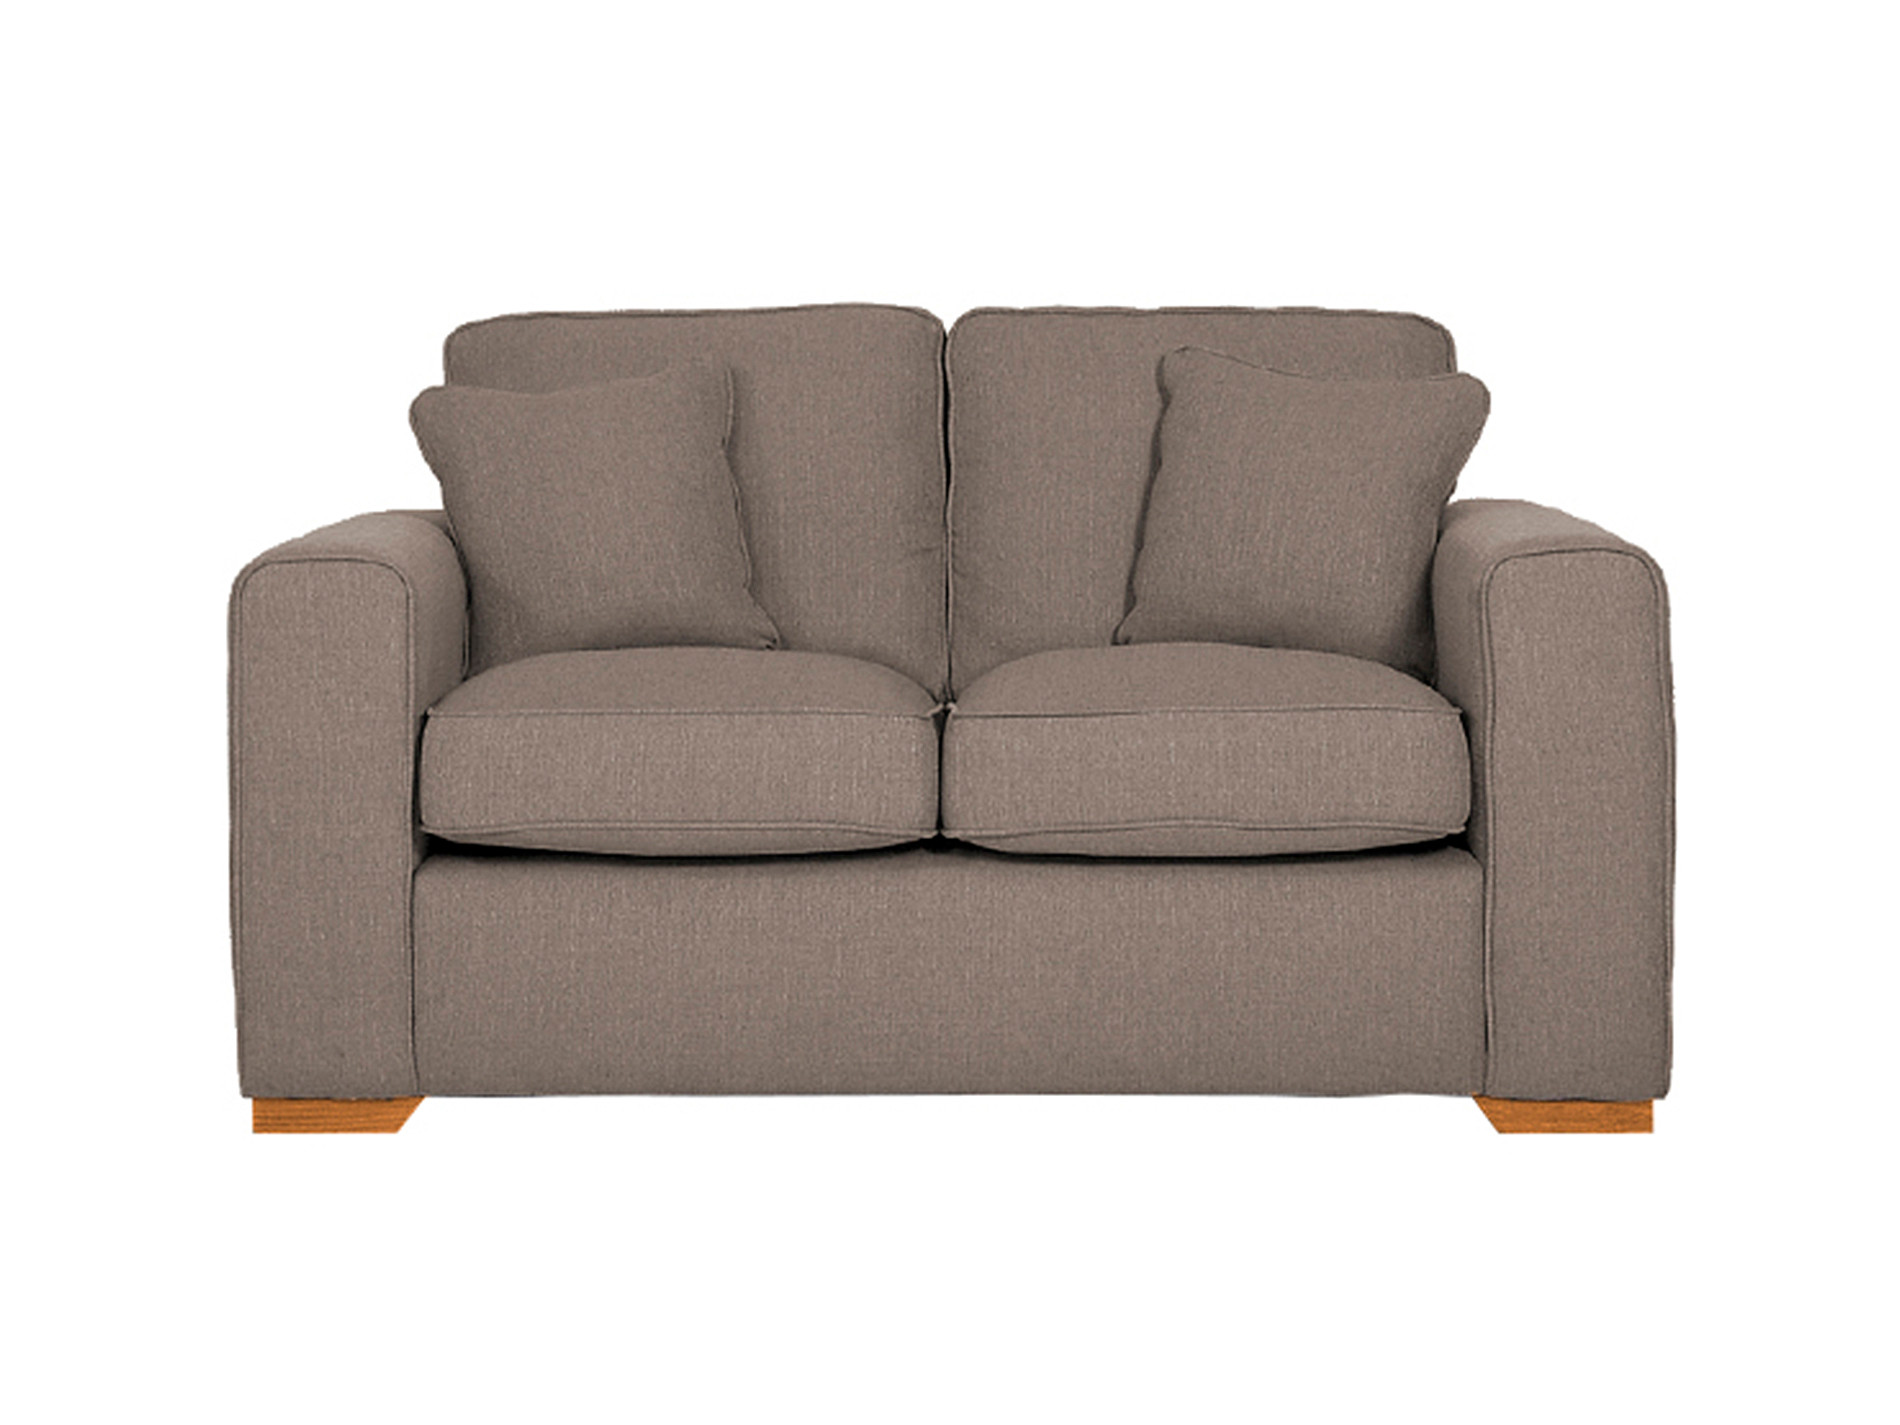 Harrison Small Sofa Bed Costa Stone With Rustic Oak Feet